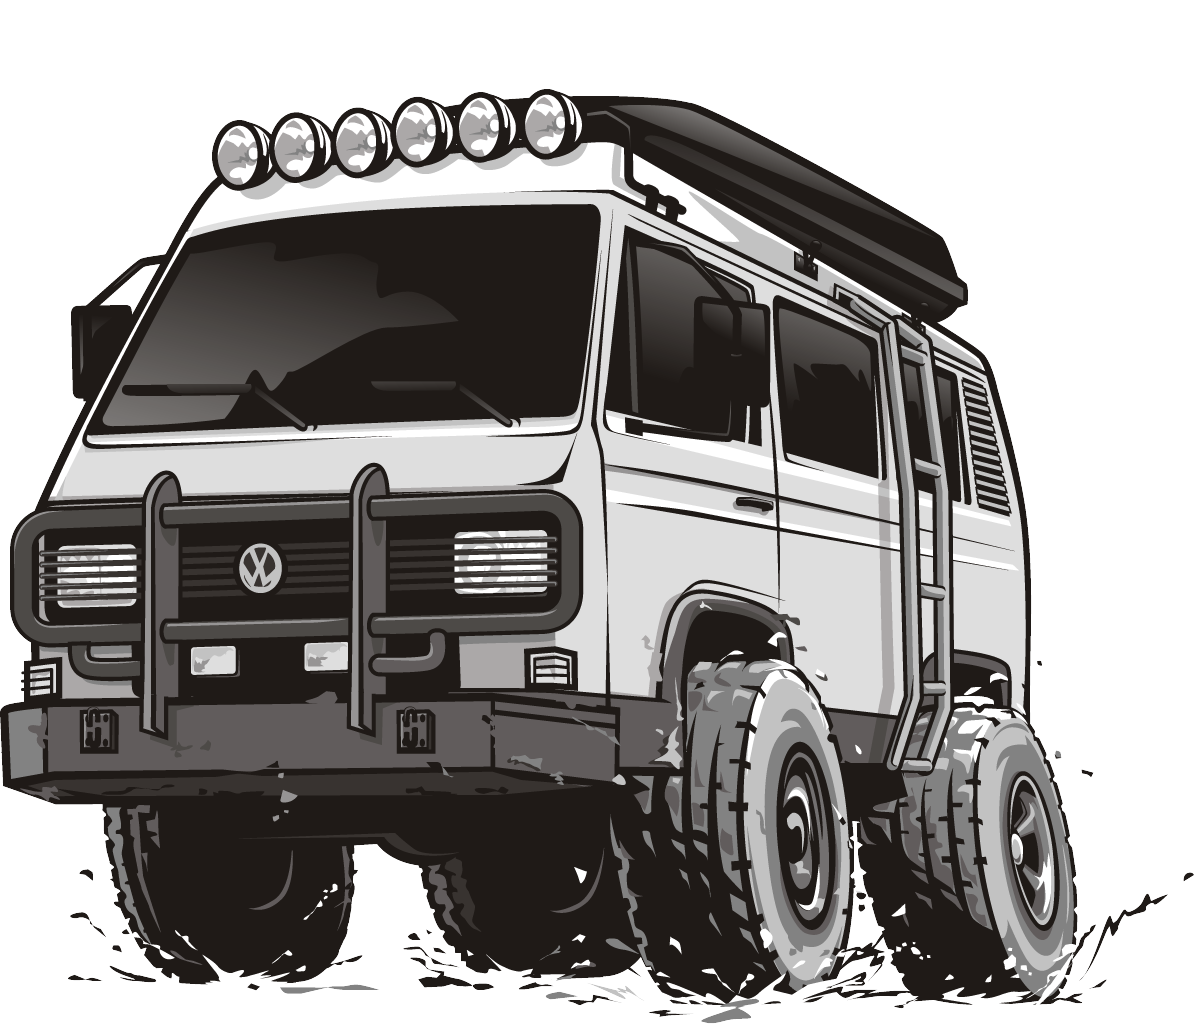 HotRod Style Vans (2 Manufacturers)